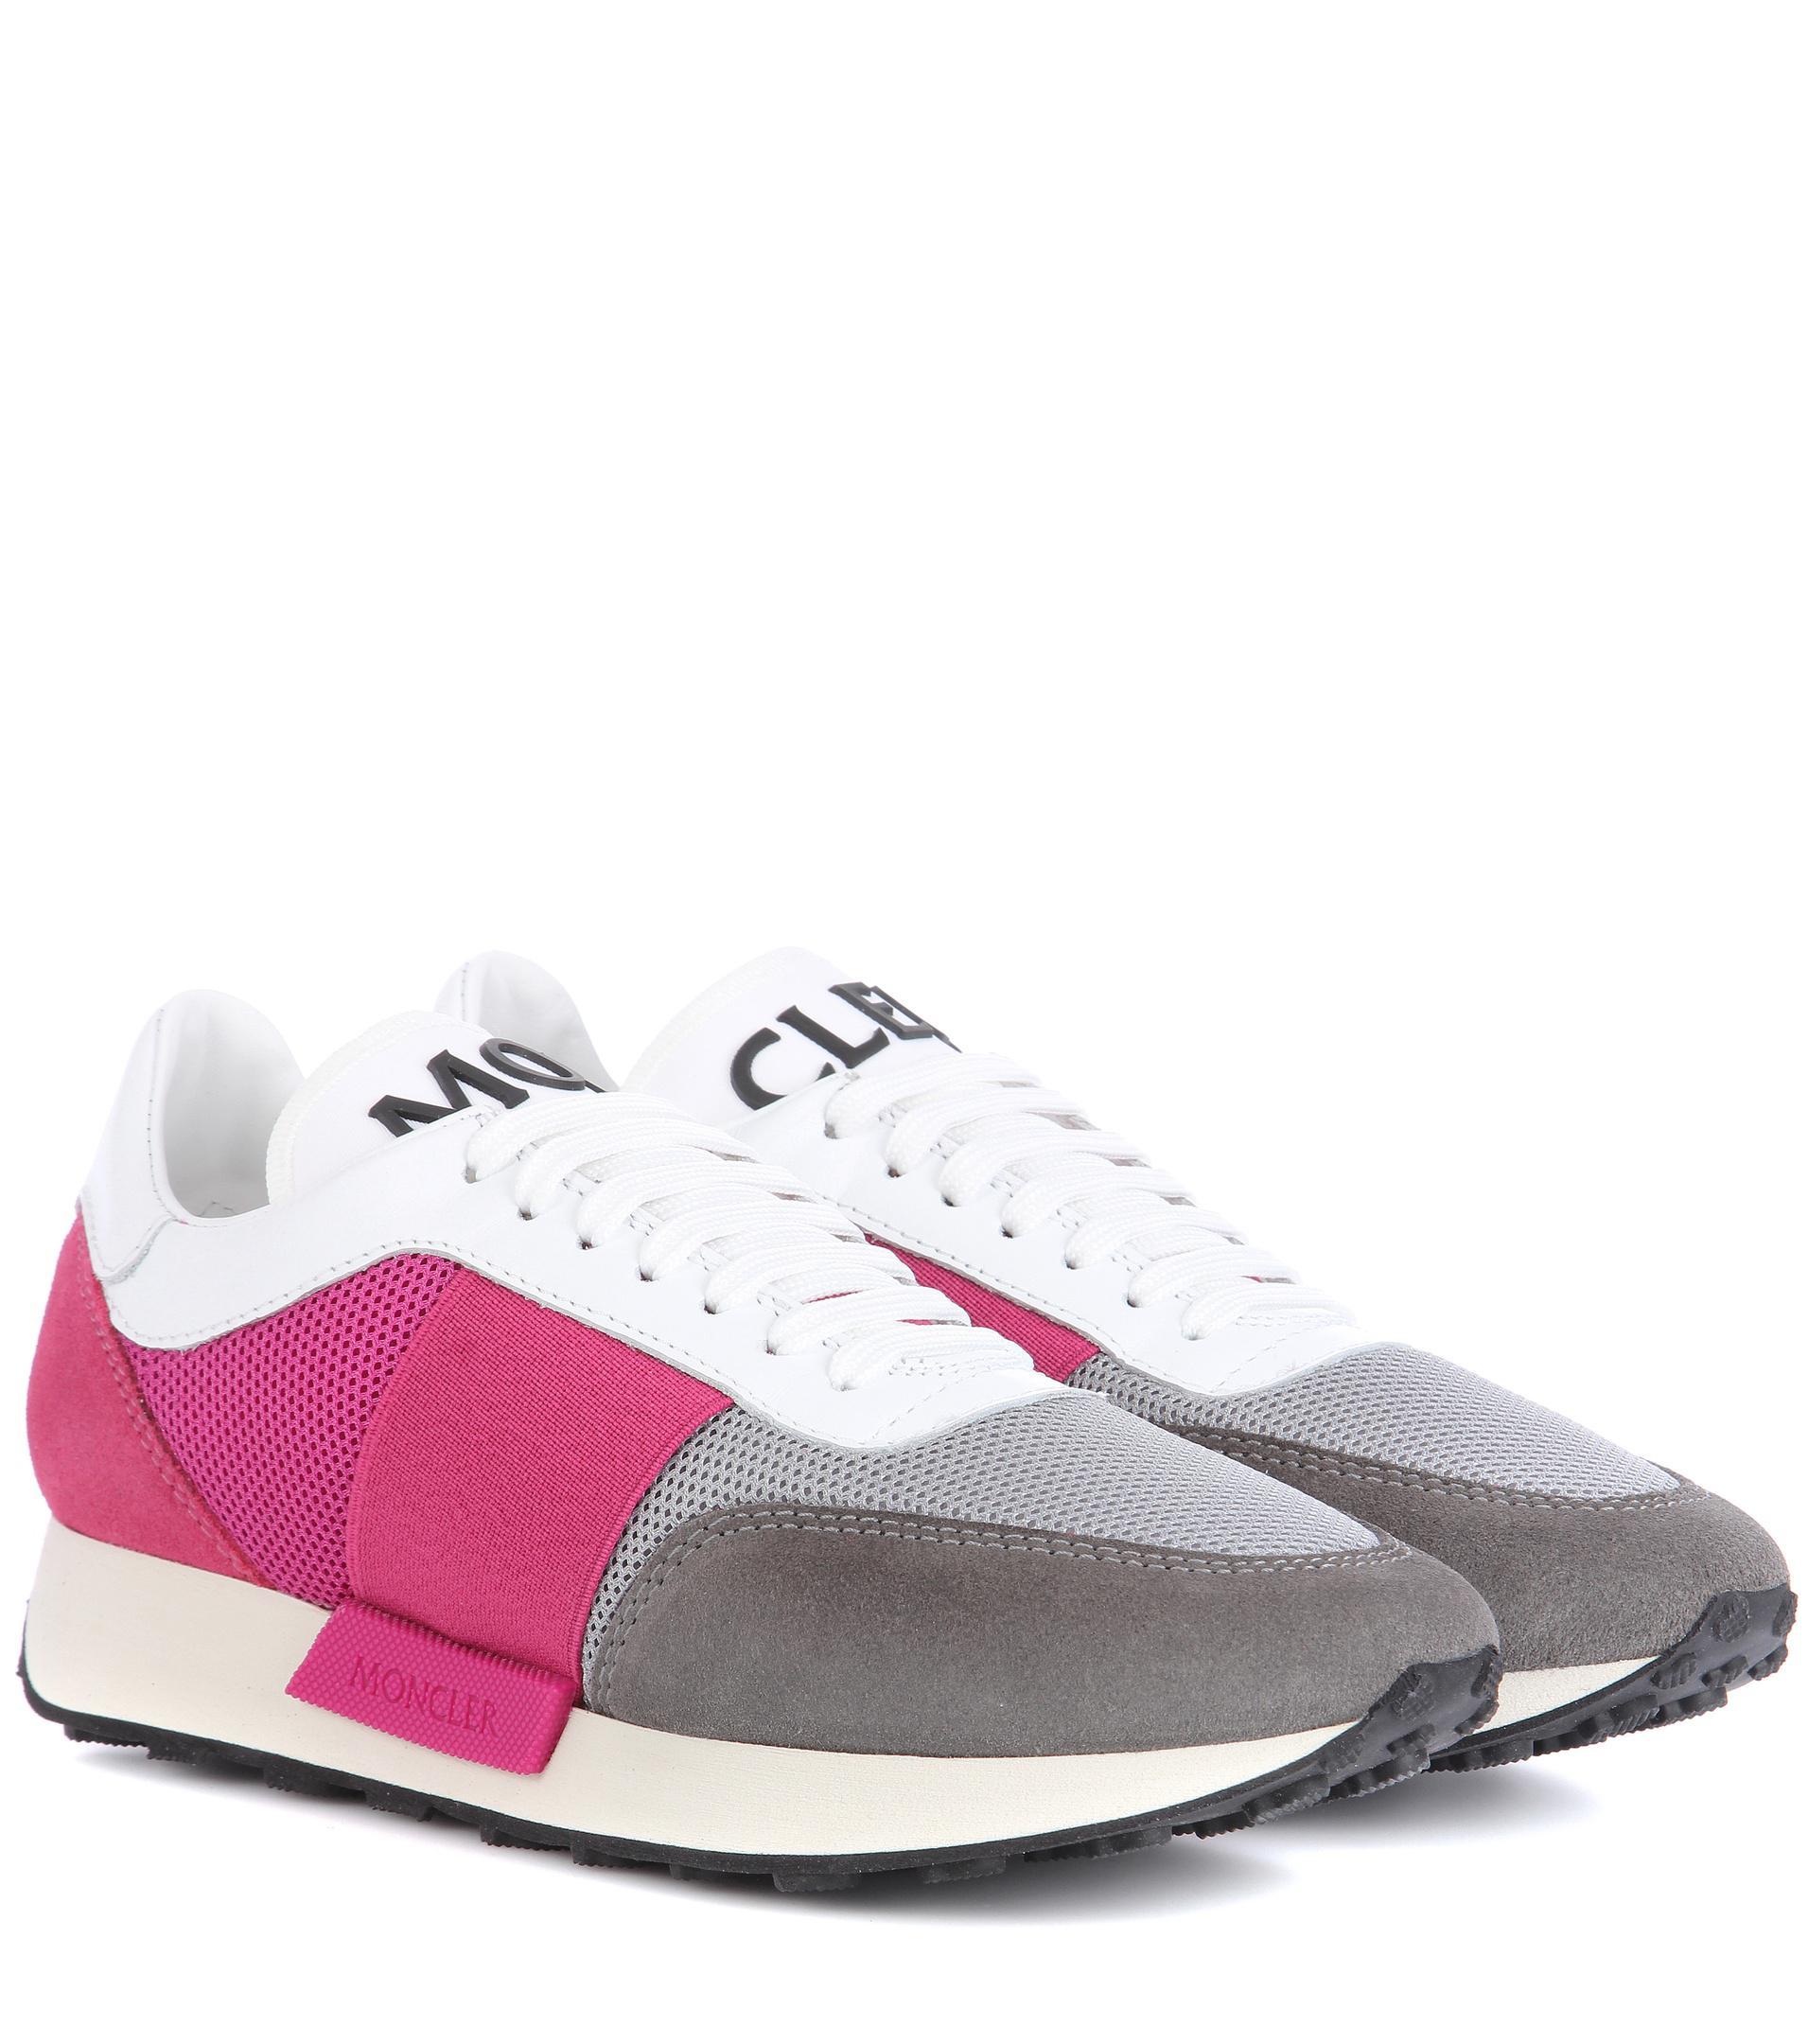 b418aa61ca0 Moncler - Multicolor Louise Sneakers - Lyst. View fullscreen